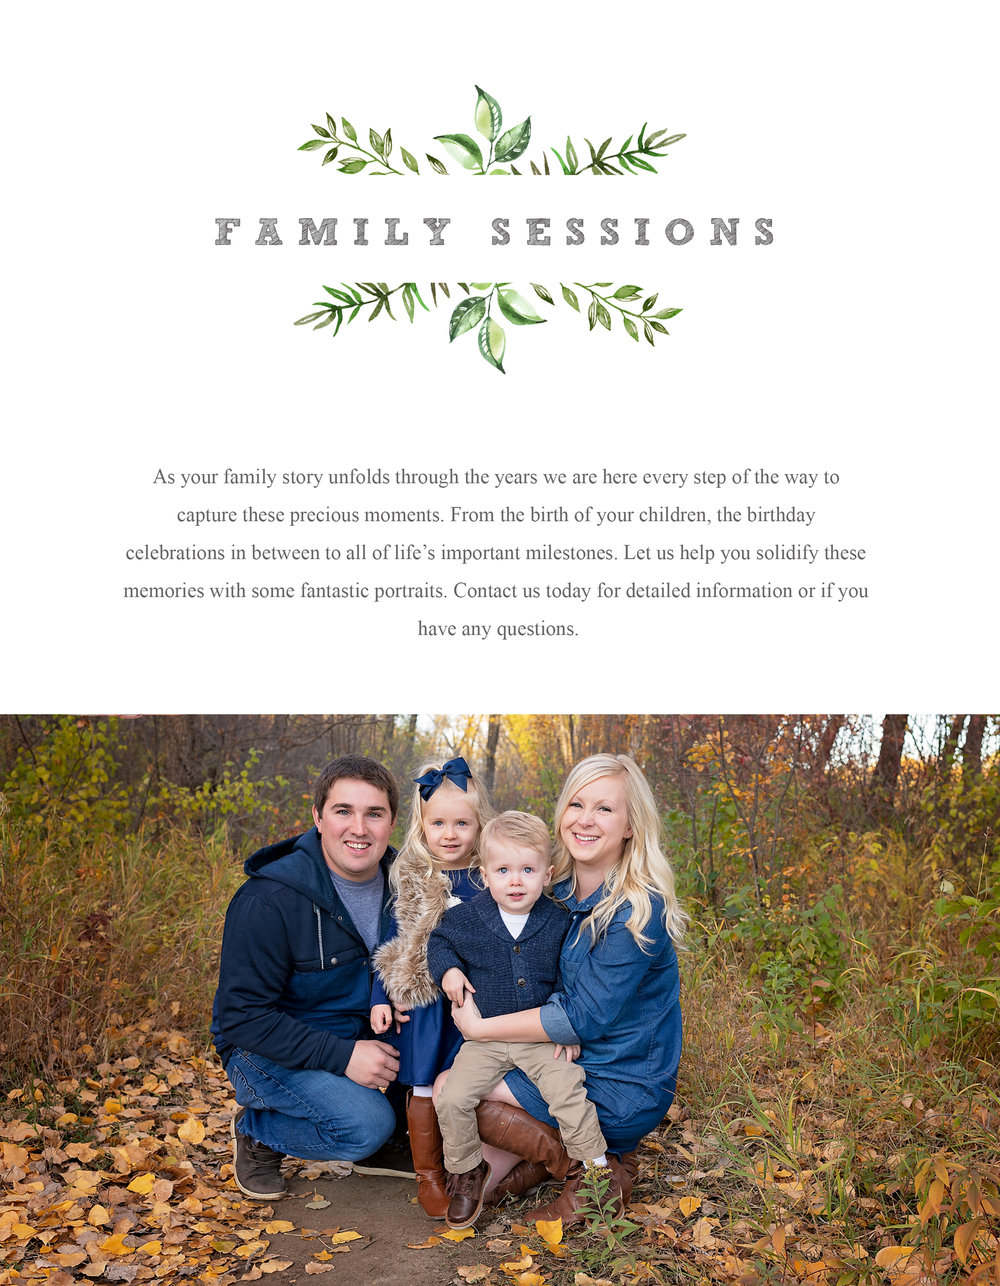 5-FamilySession-Recovered.jpg